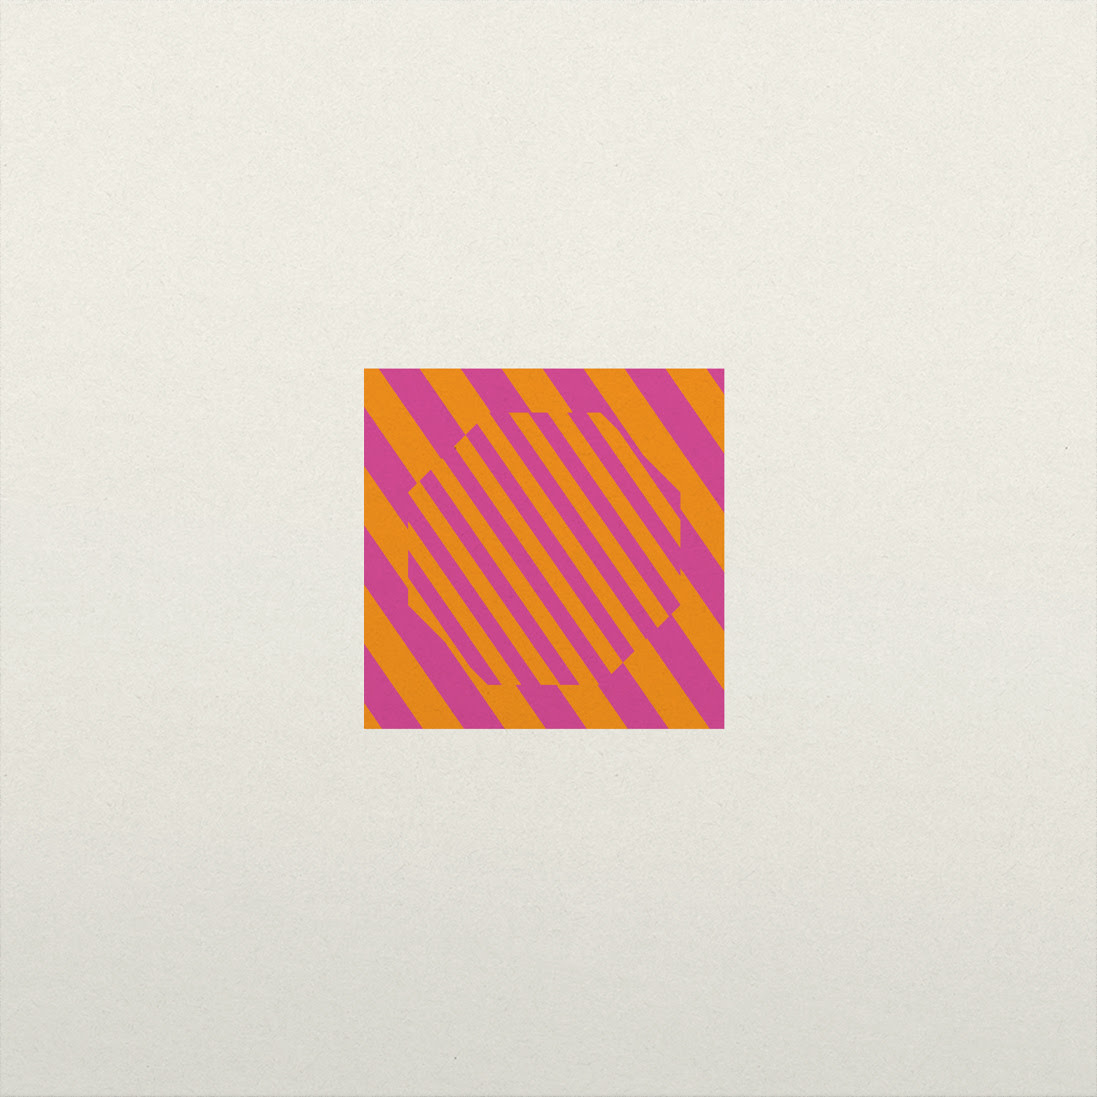 City Slang Caribou - Suddenly Remixes EP